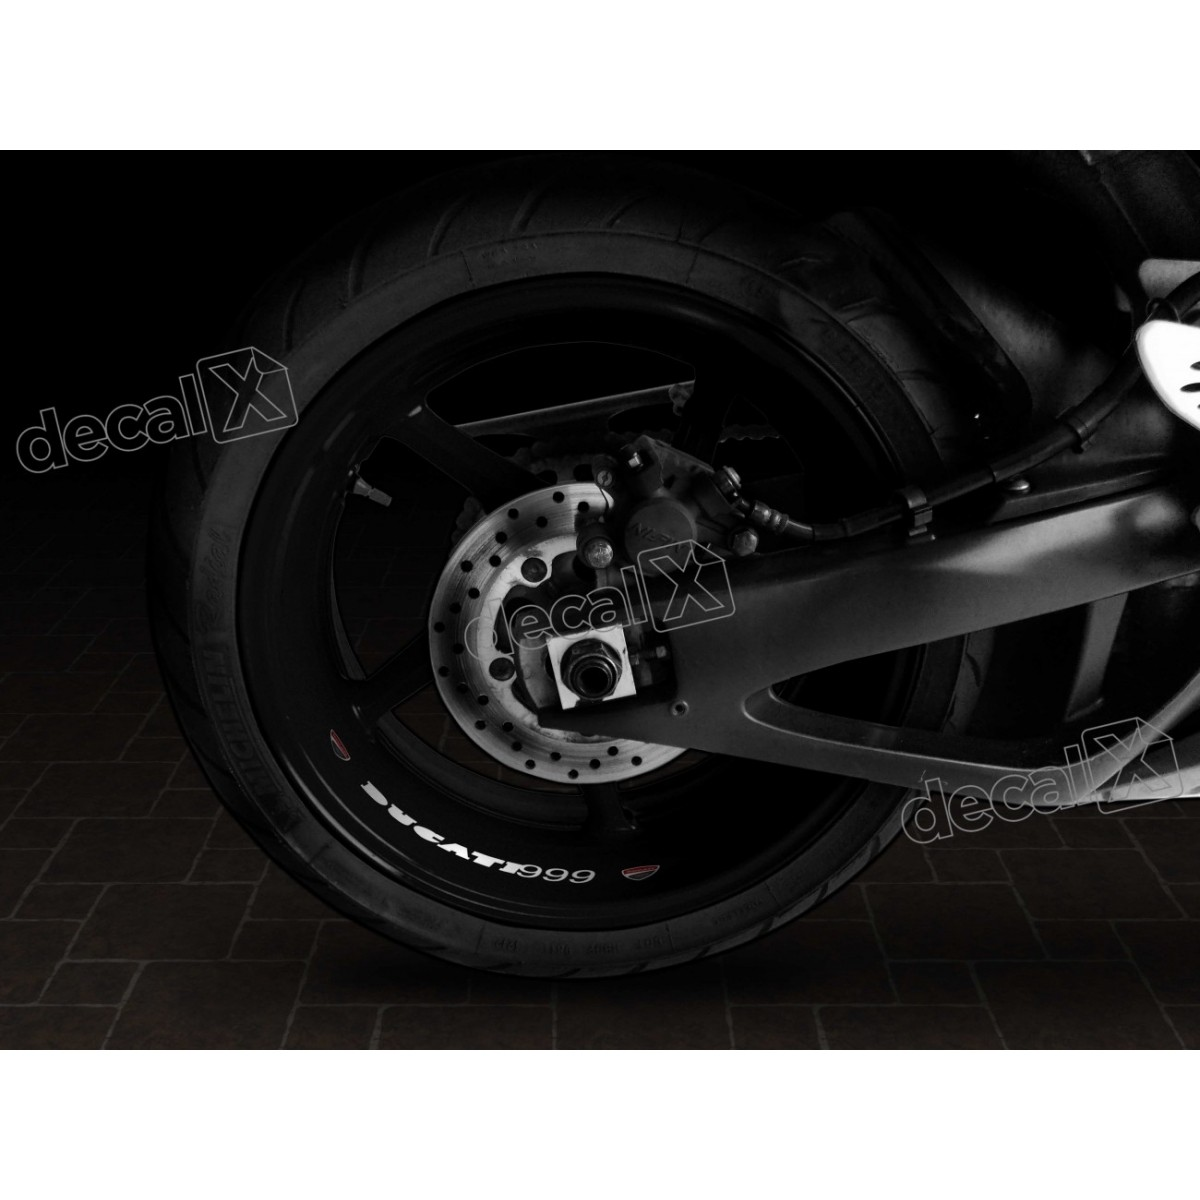 Adesivos Centro Roda Refletivo Moto Ducati 999 Rd4 - Decalx